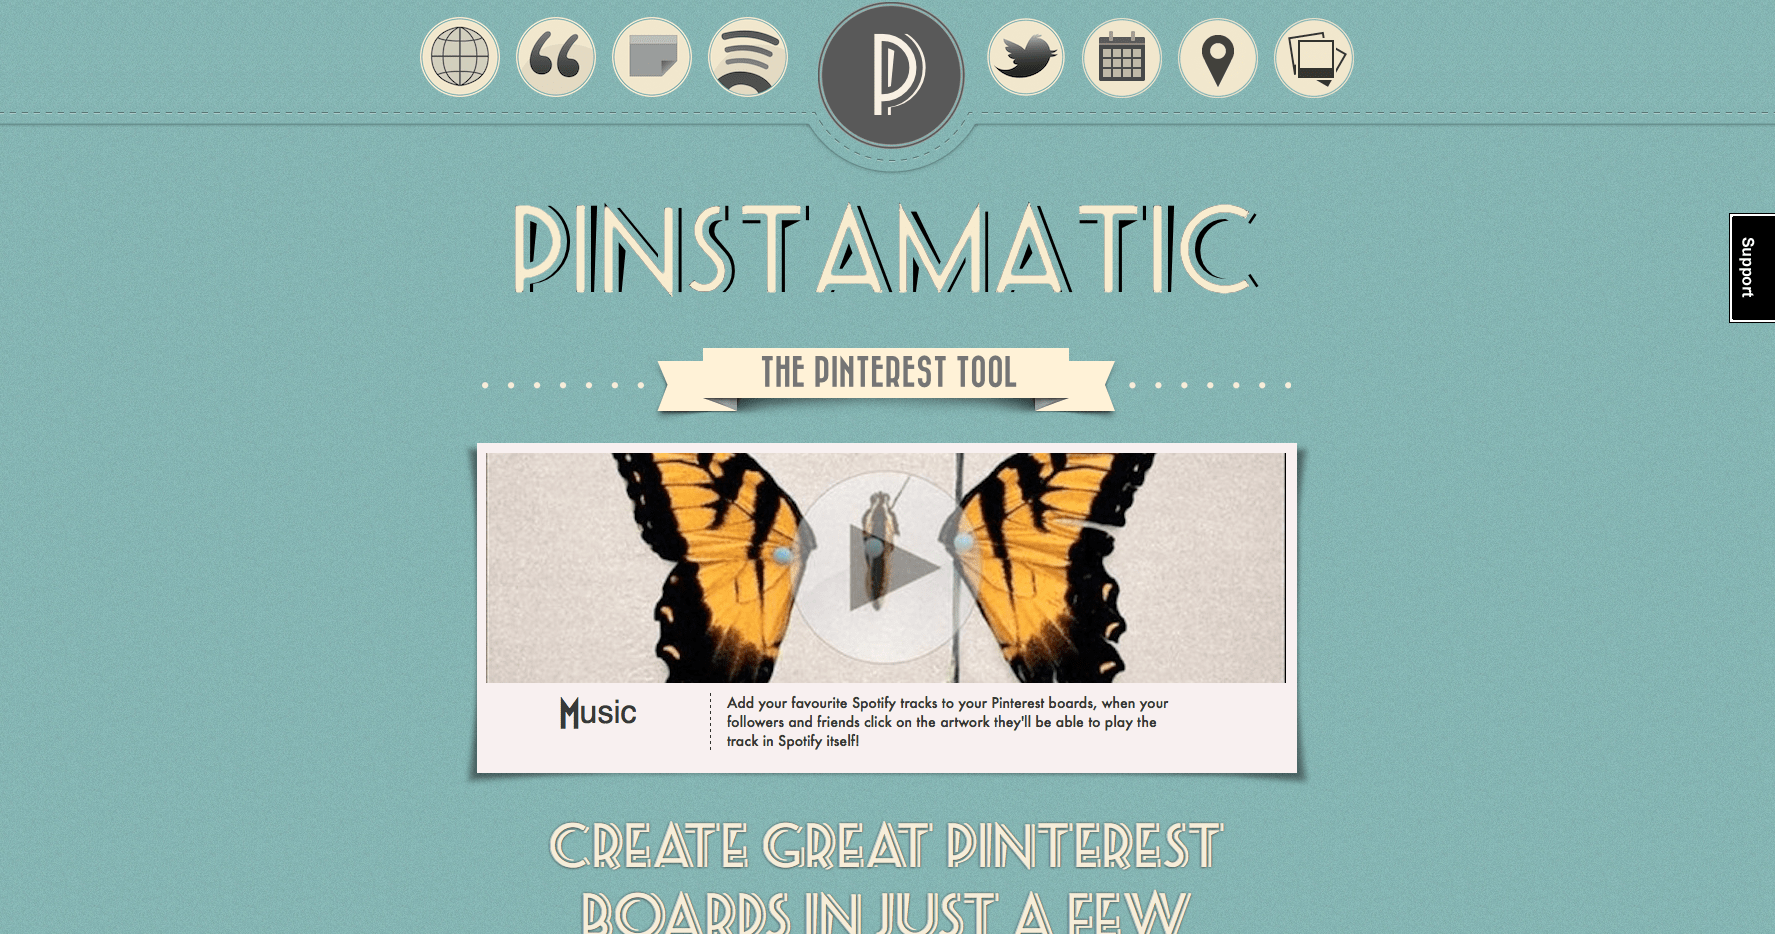 criar imagens Pinstamatic